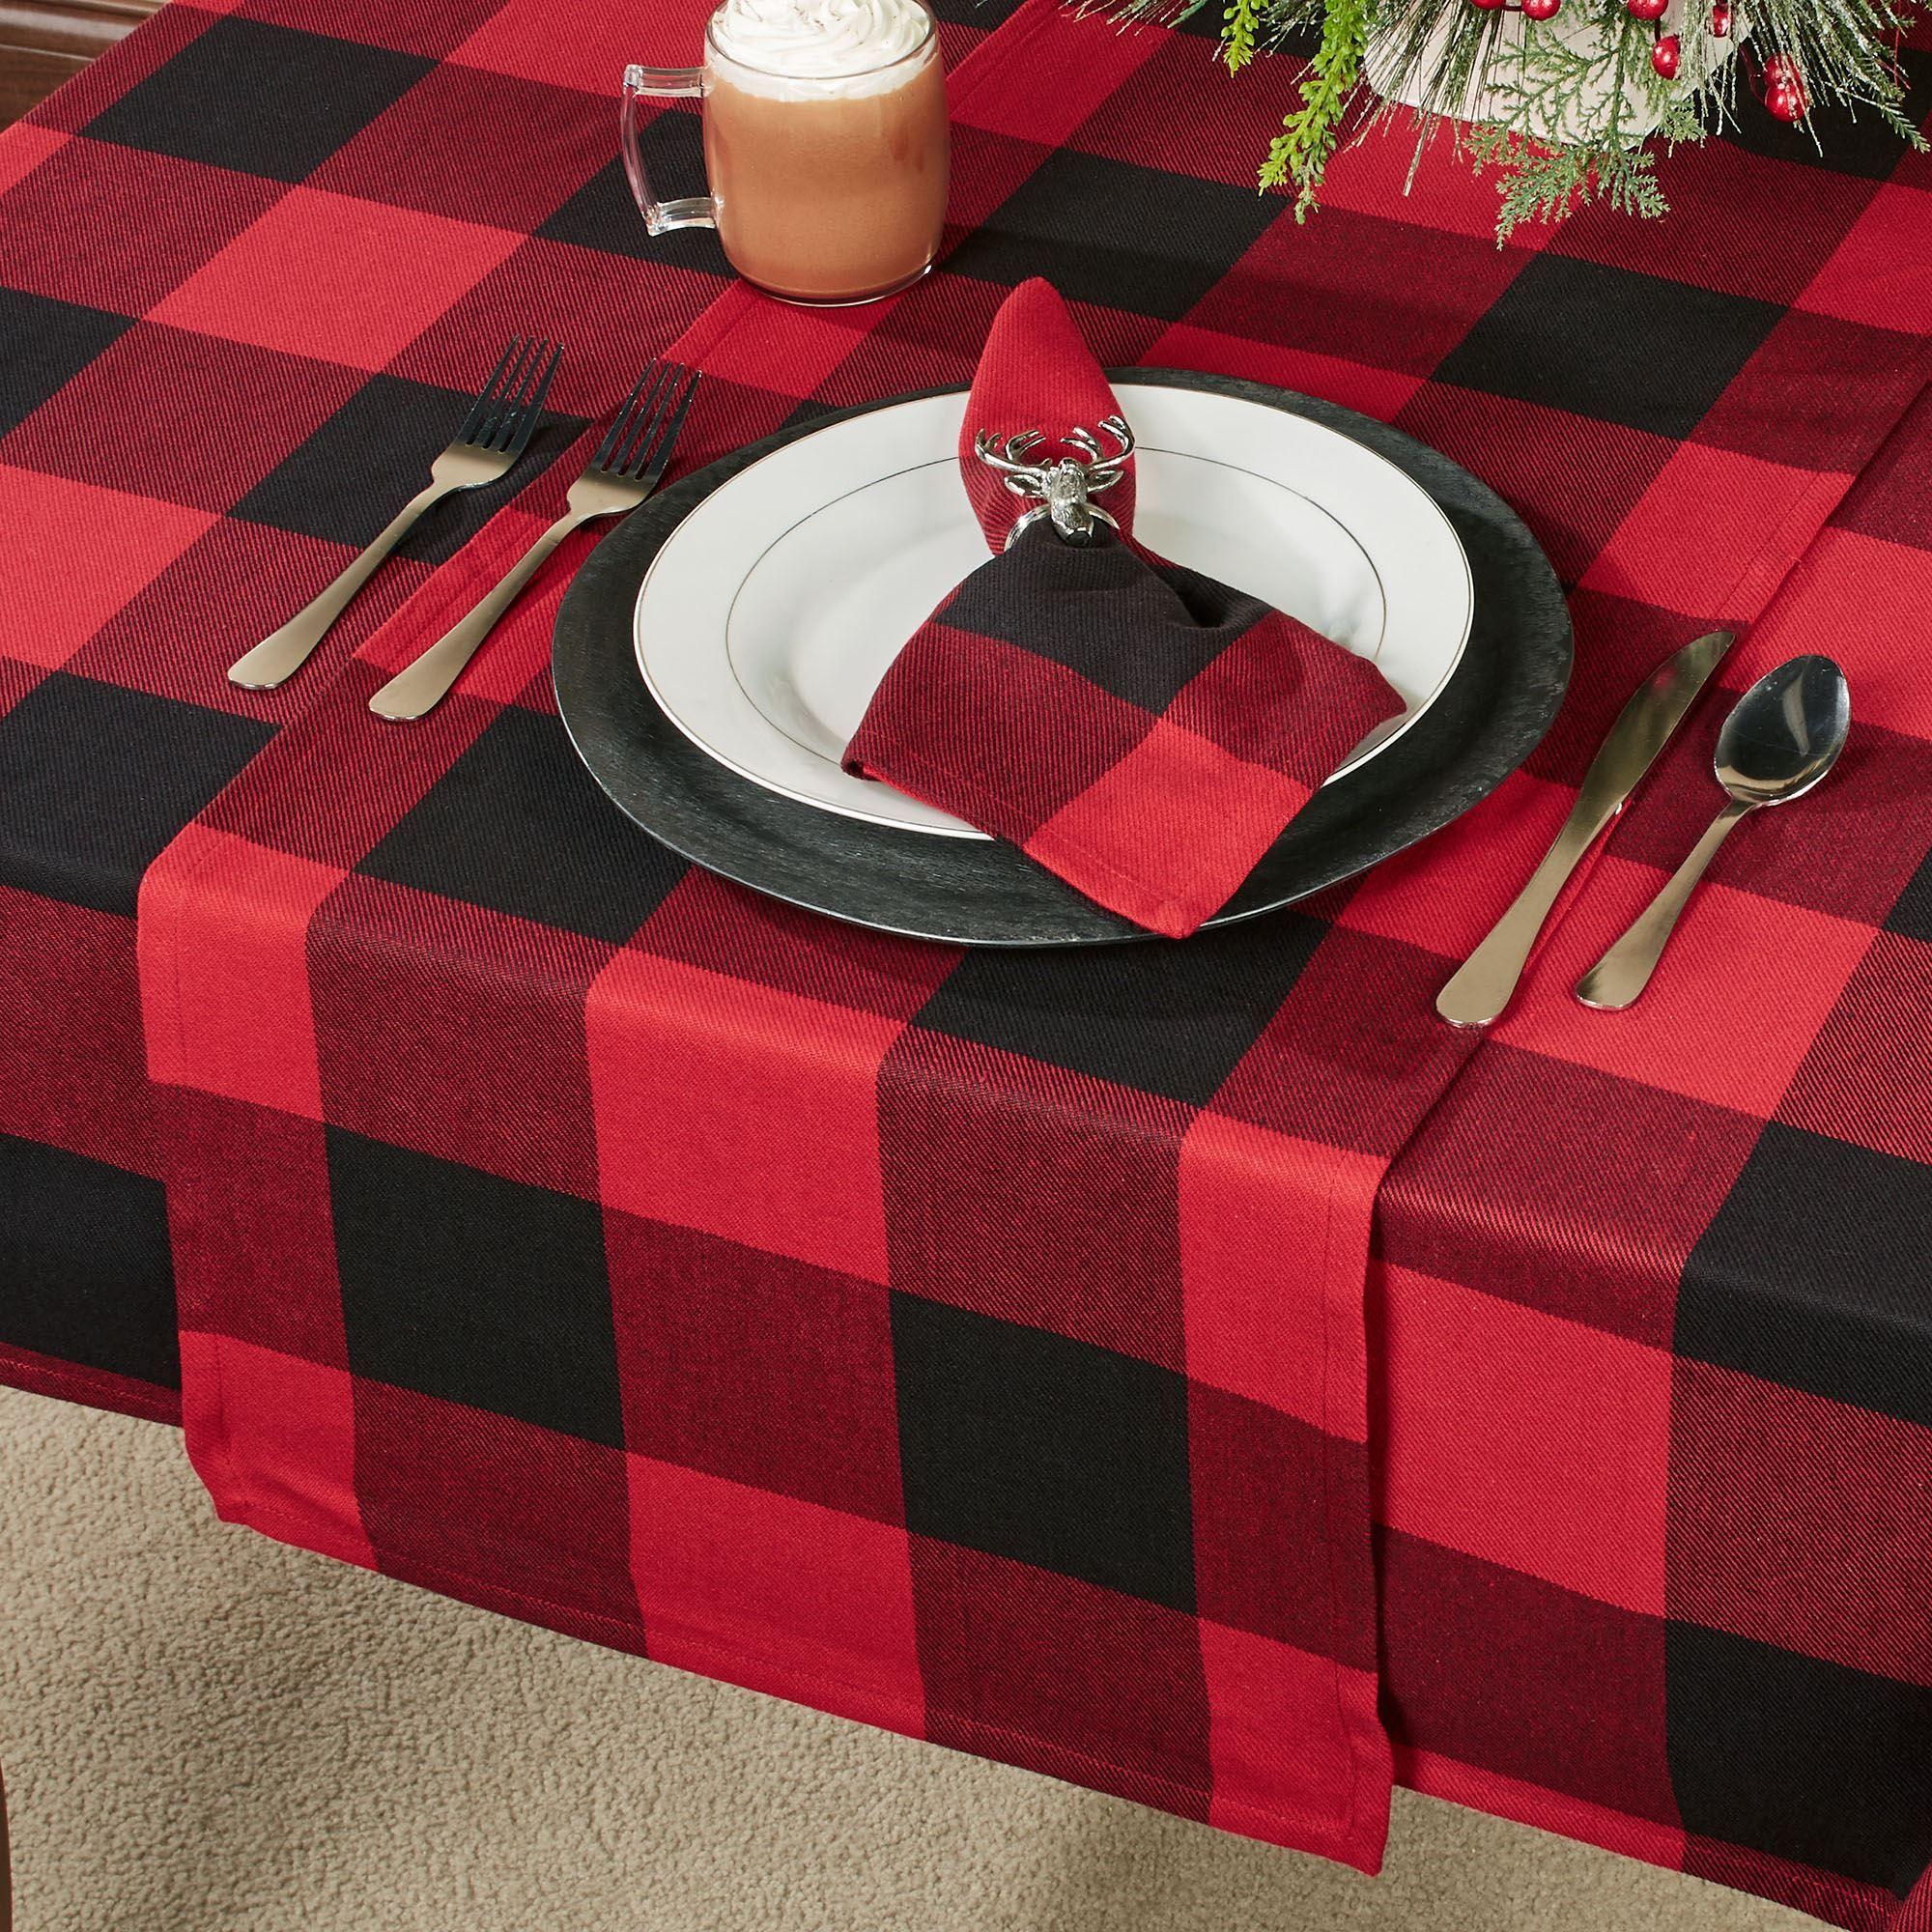 Rustic Buffalo Plaid Table Runner Red Black 16 X 72